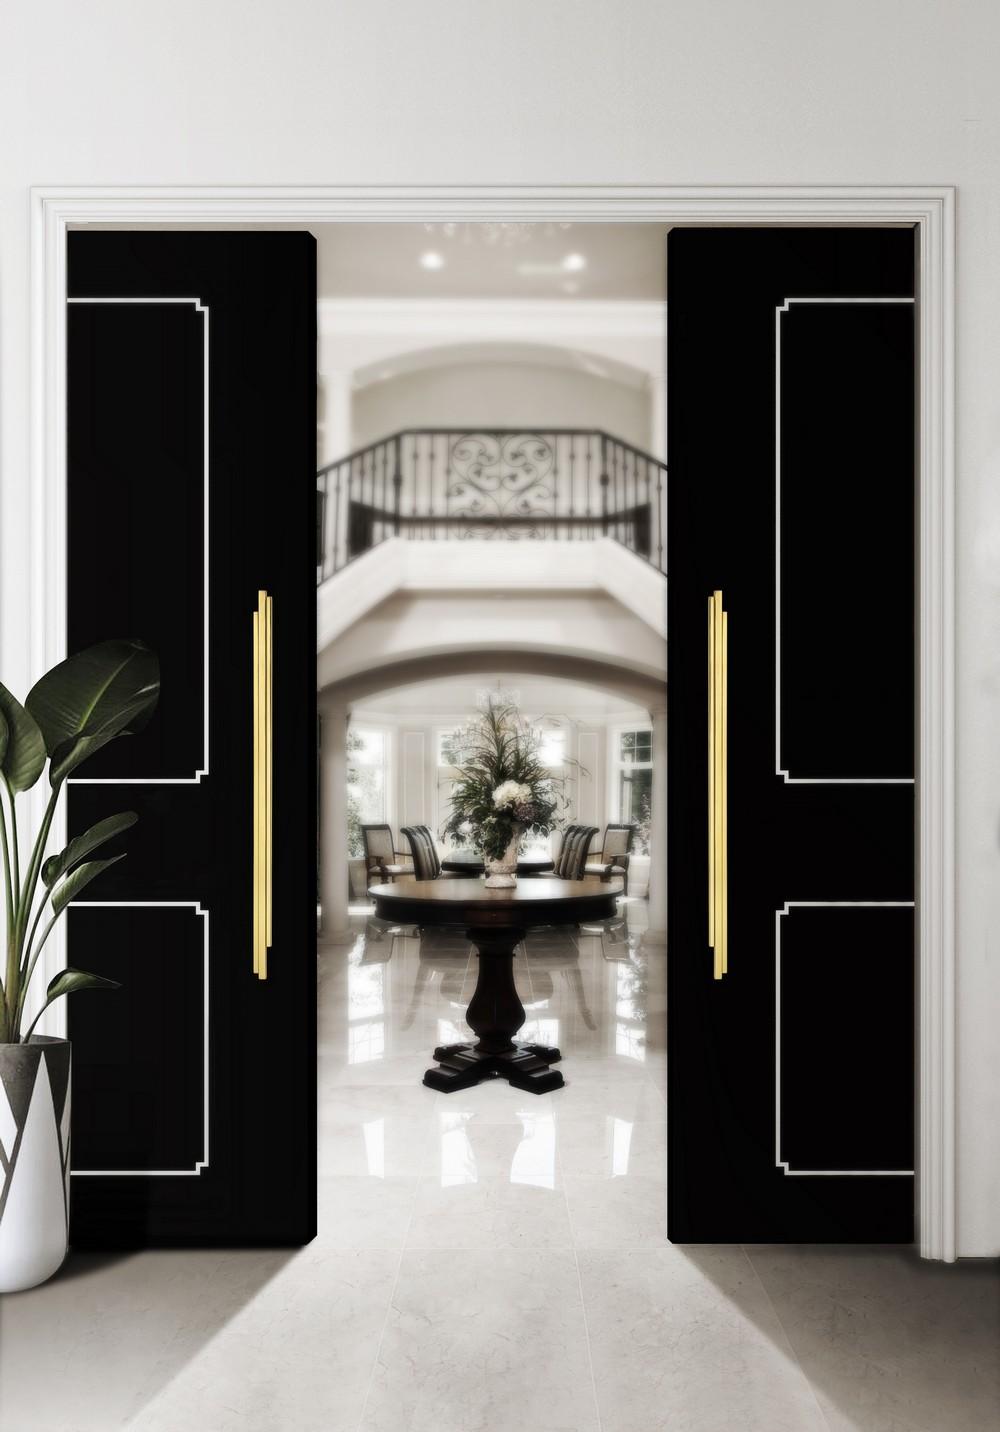 interior design Interior Design Inspiration: Decorative Hardware Trends for 2020 Interior Design Inspiration Decorative Hardware Trends for 2020 5